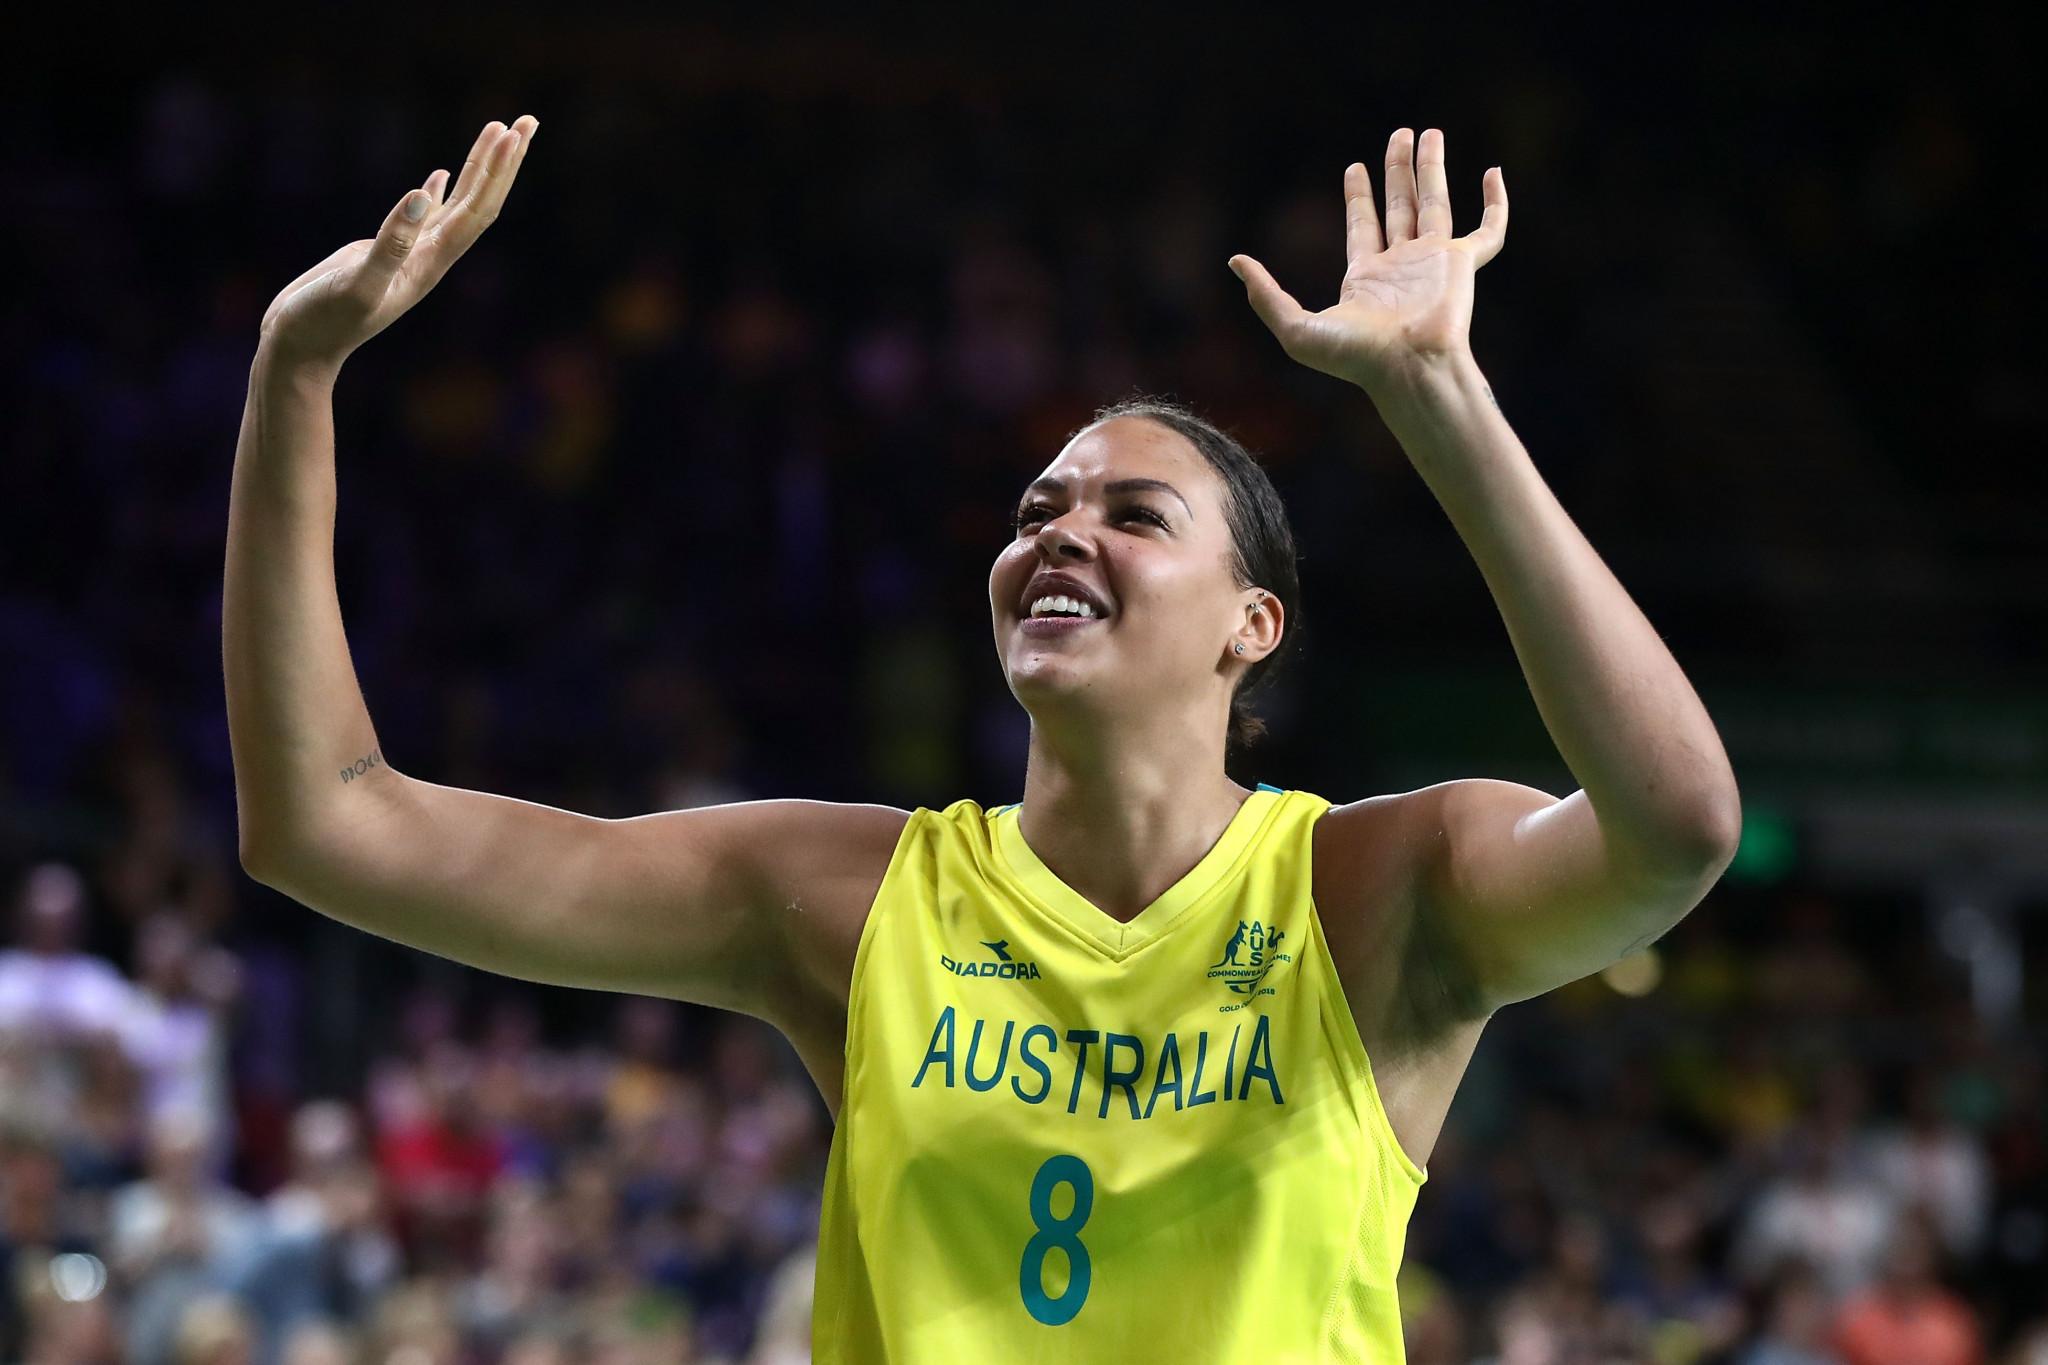 Australian basketballer Cambage threatens Tokyo 2020 boycott over diversity row